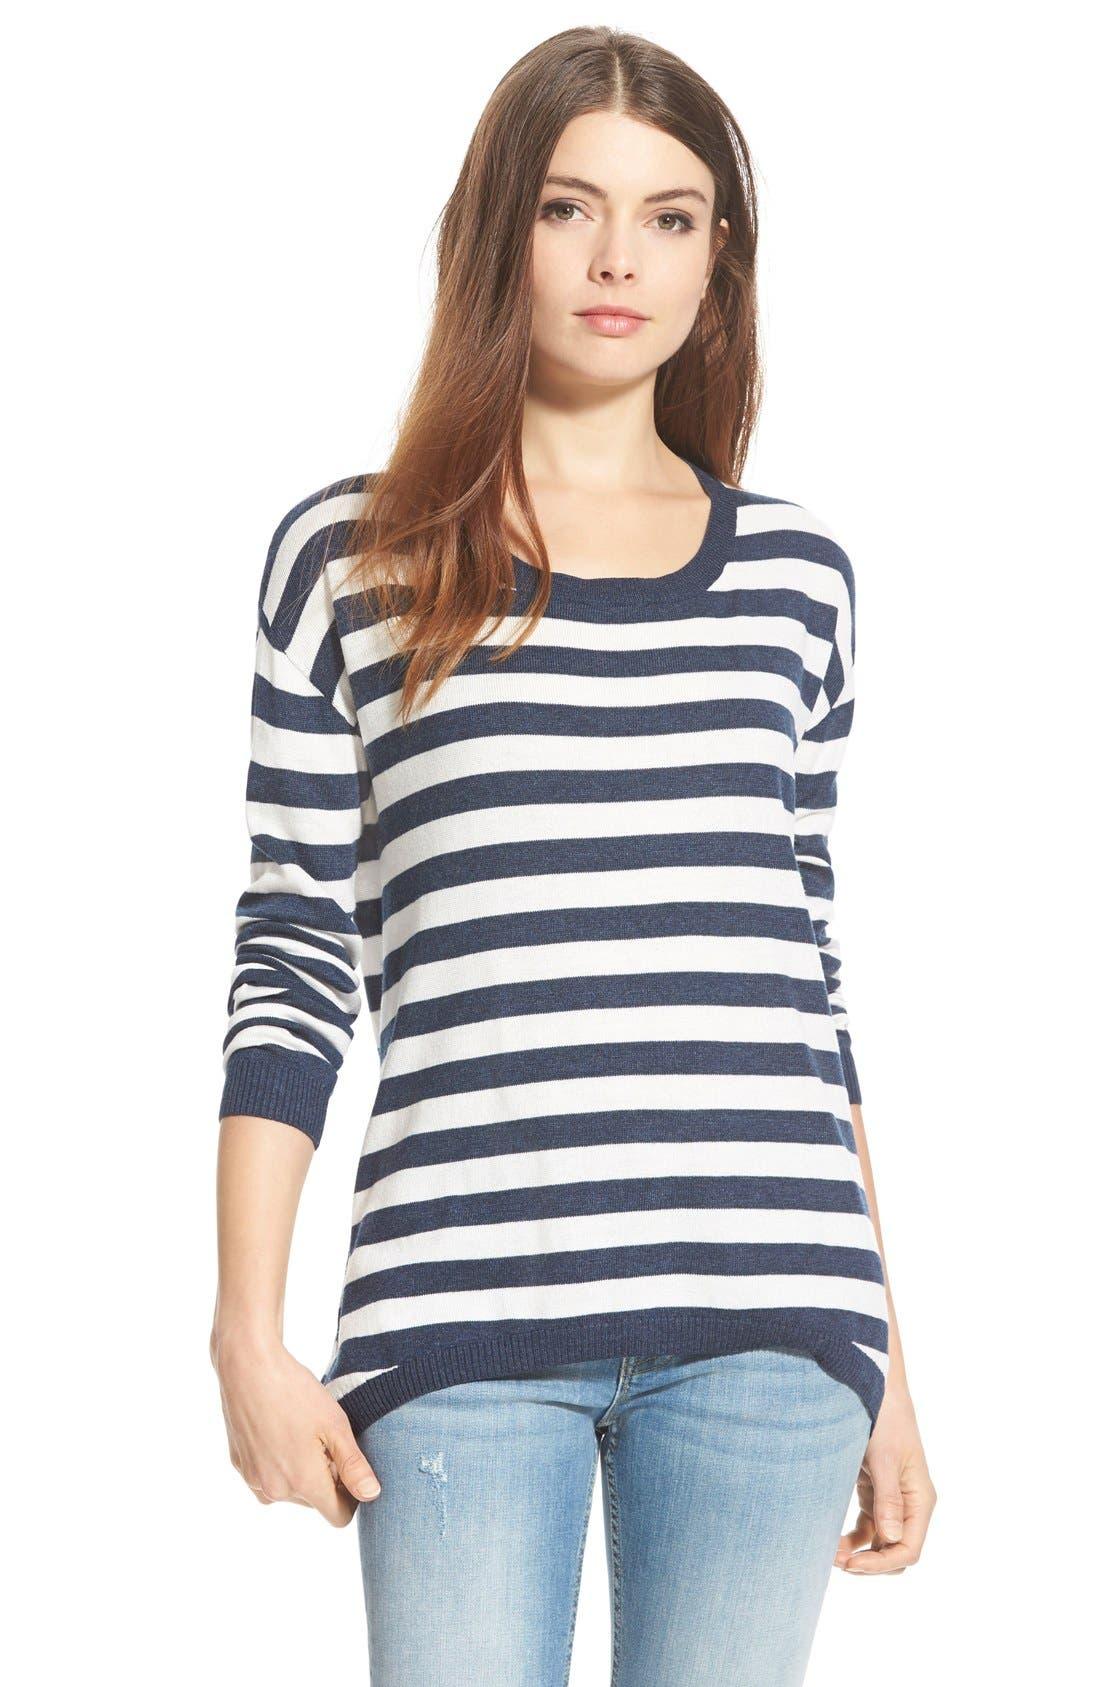 Alternate Image 1 Selected - BP. Stripe Scoop Neck Pullover